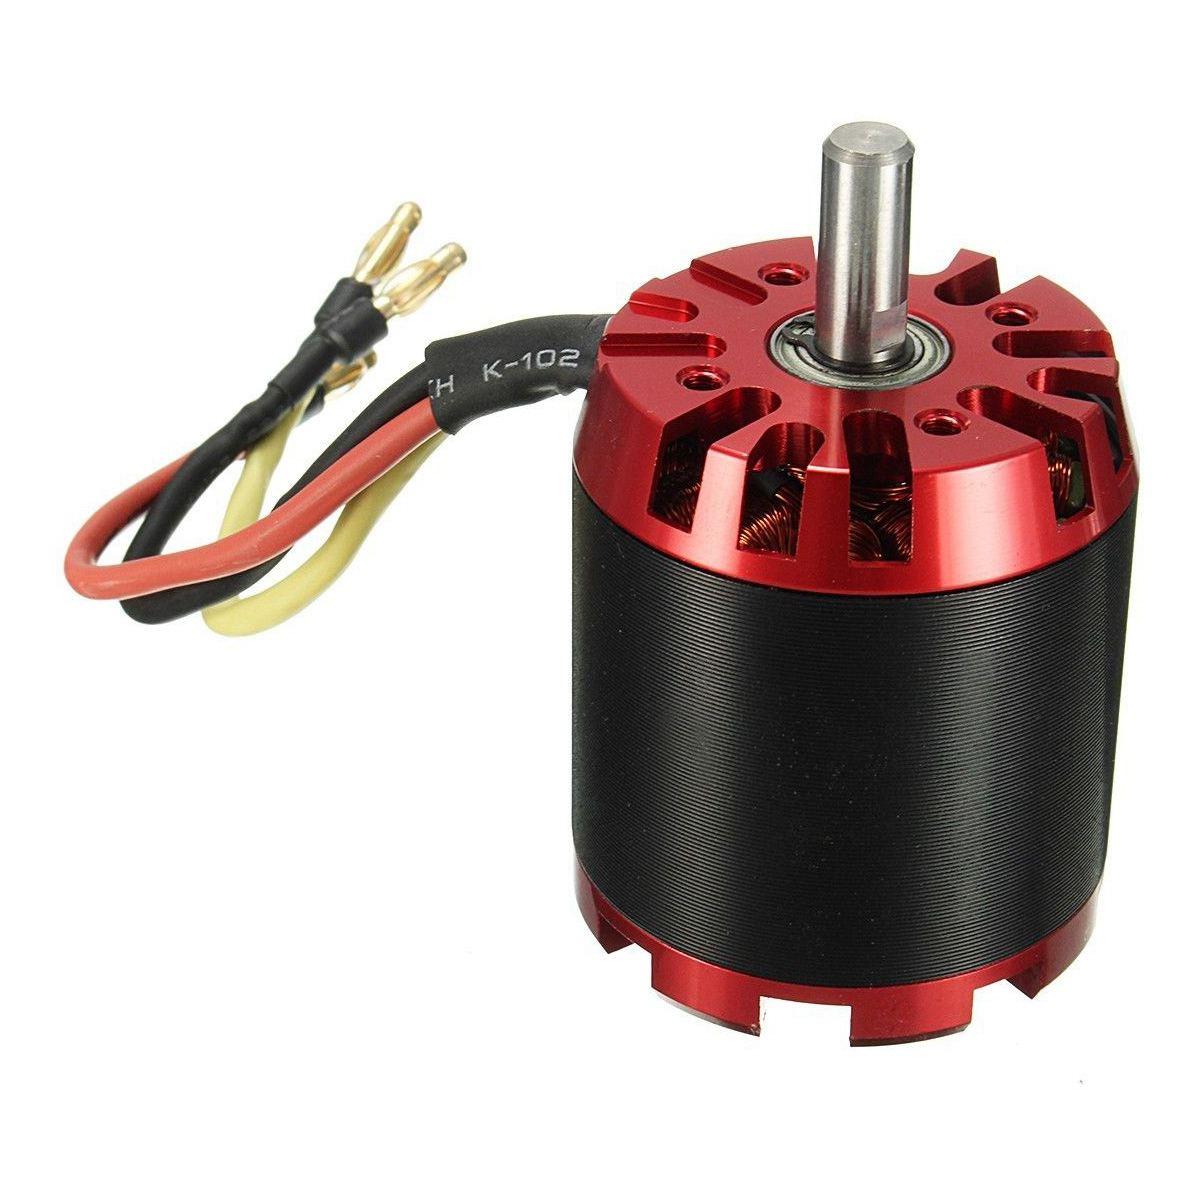 Motor sin escobillas Outrunner N5065 320KV para Kit de patines eléctricos DIY